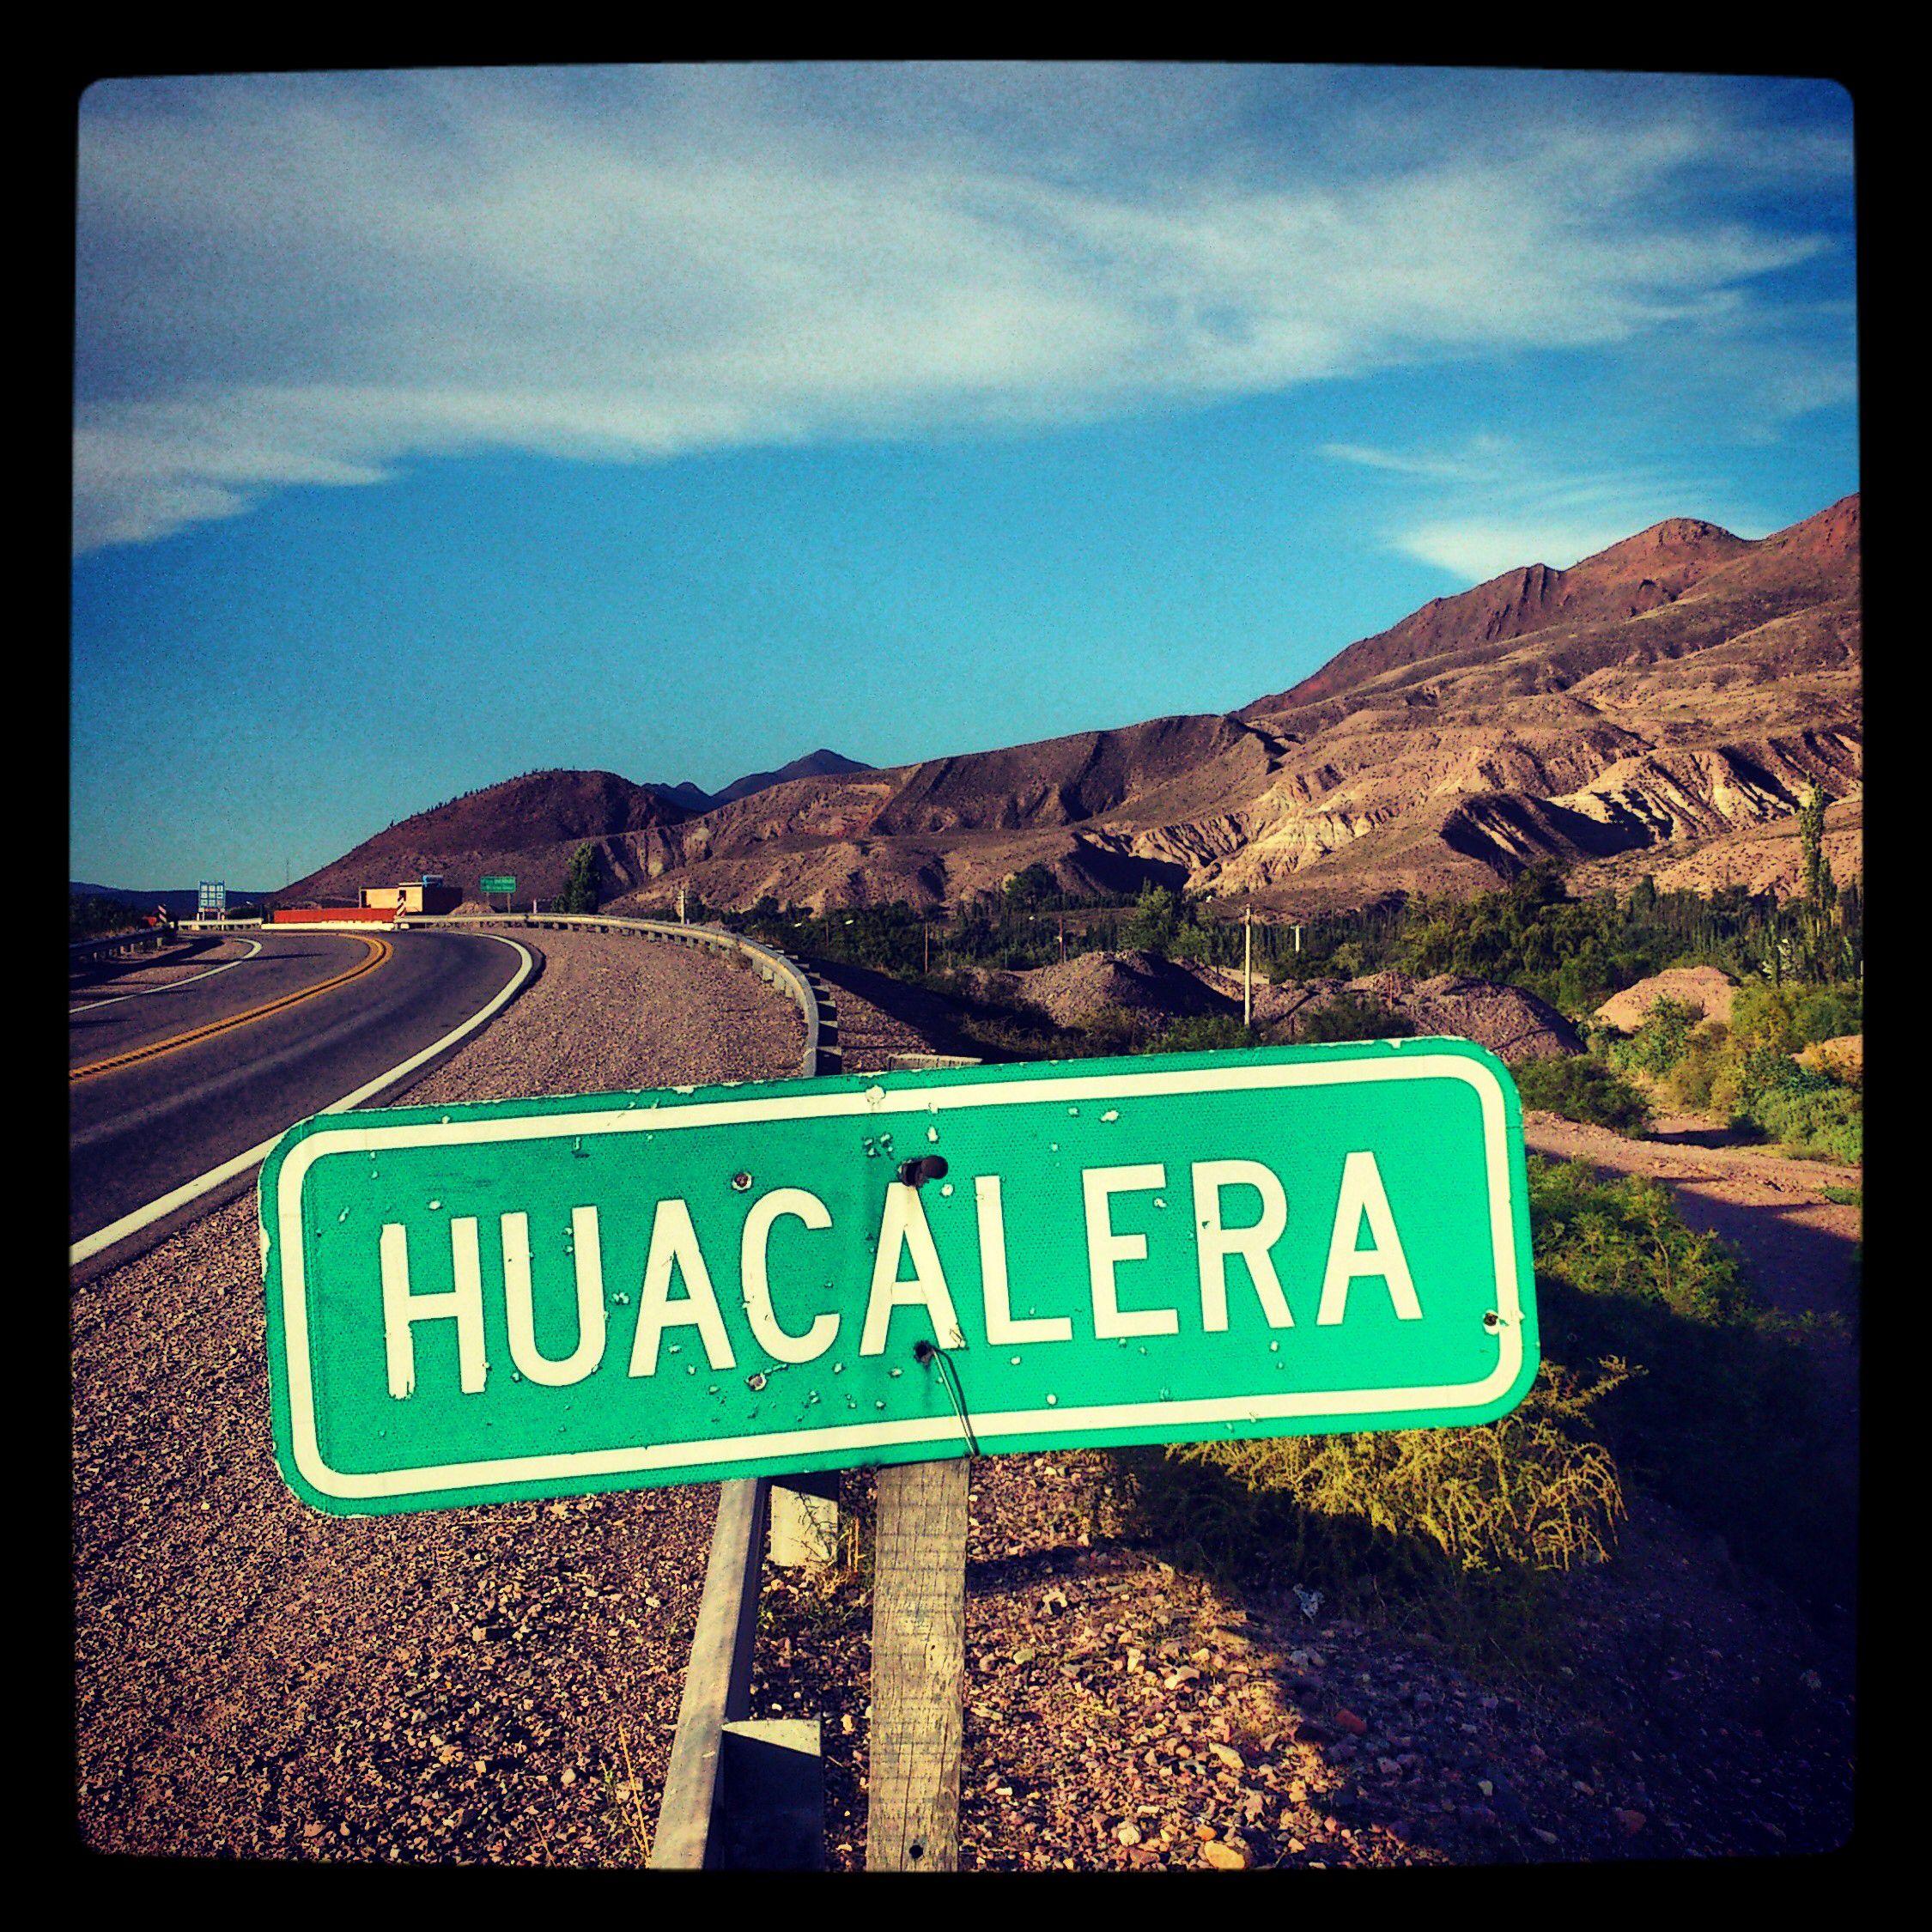 Huacalera, puna jujeña, Argentina